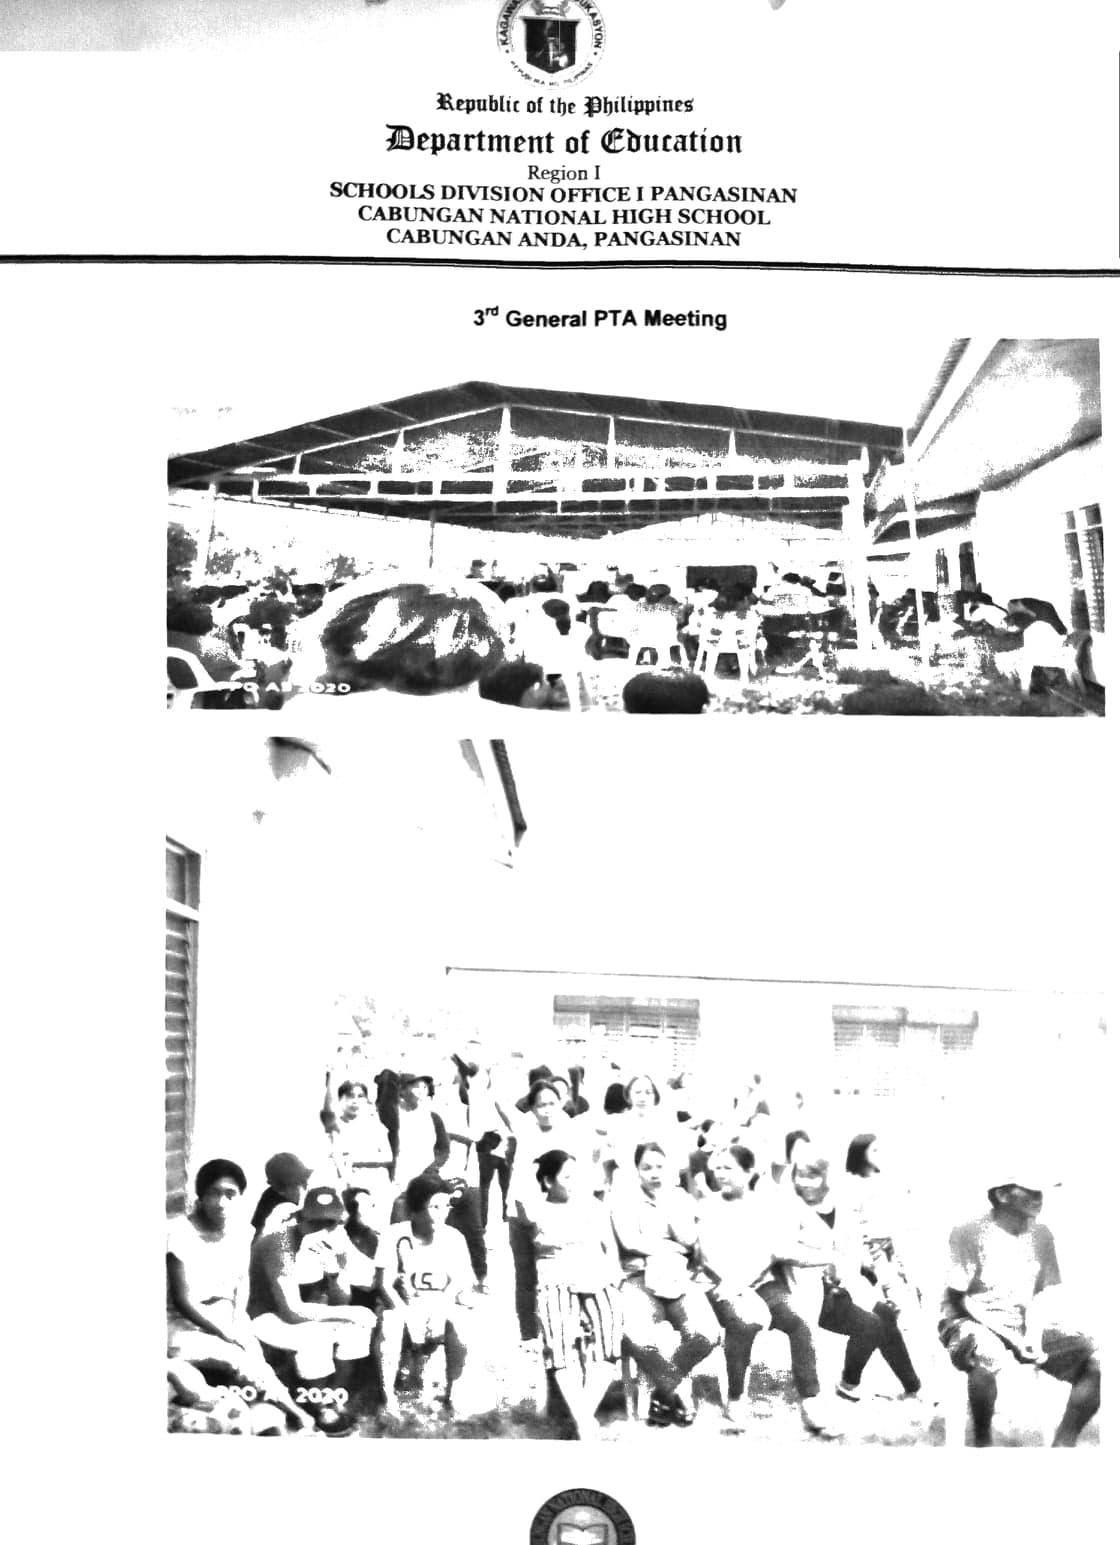 Cabungan National High School: MINUTES OF MEETING